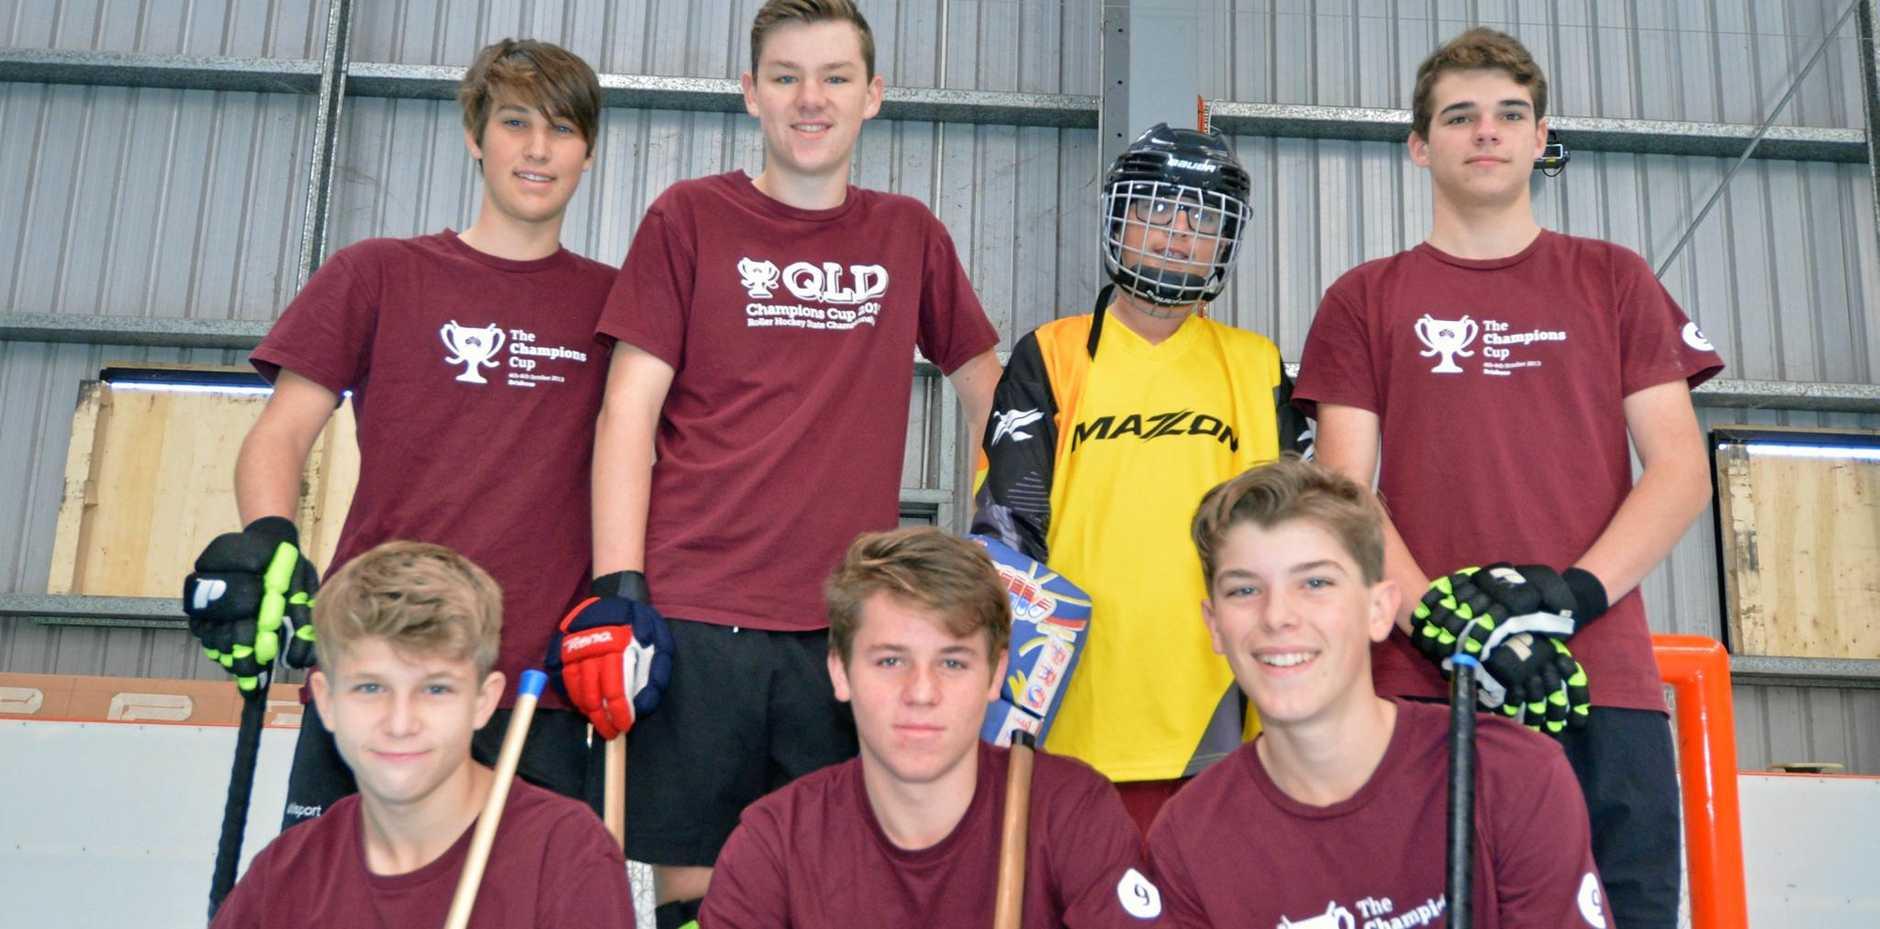 STATE REPS: Back from left, Max Hall, Josh Nyberg, Cody-Jon Gardner, Jay Burnett, Bailey Buckley, Kadin Hewitt and David Kirkpatrick have been slected to represent Queensland in roller-hockey.